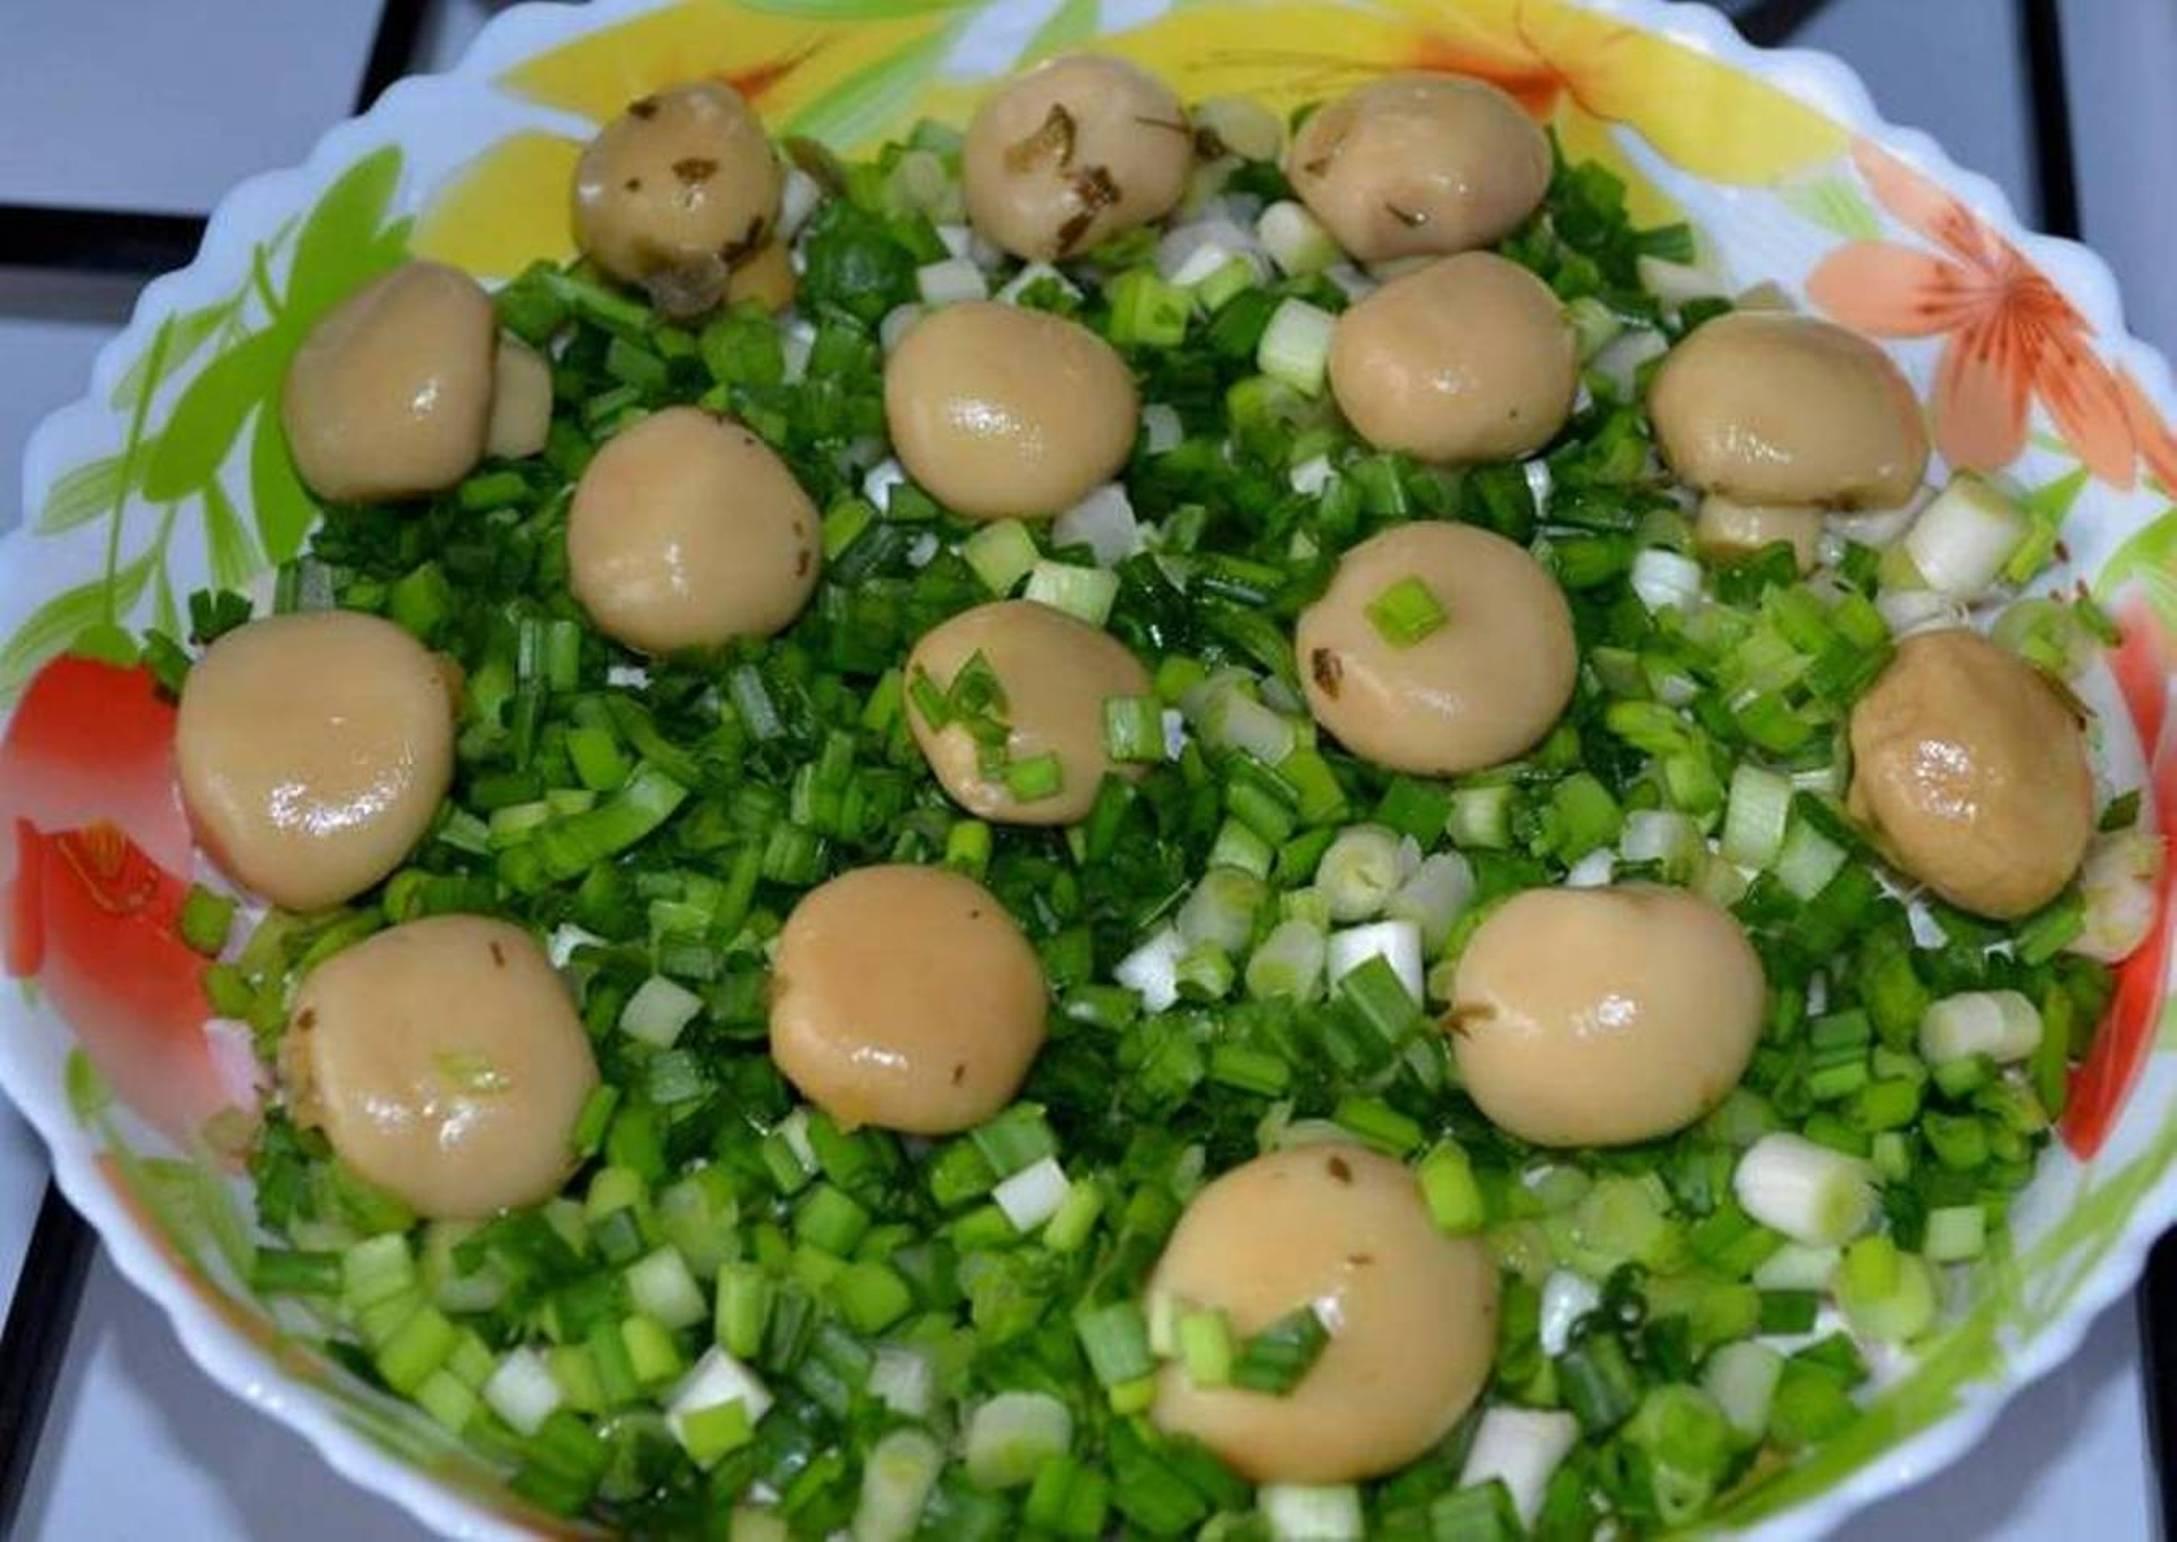 prostoi-salat-ghribnaia-poliana-s-konsiervirovannymi-shampinonami-i-vietchinoi-основное-фото-рецепта.jpg